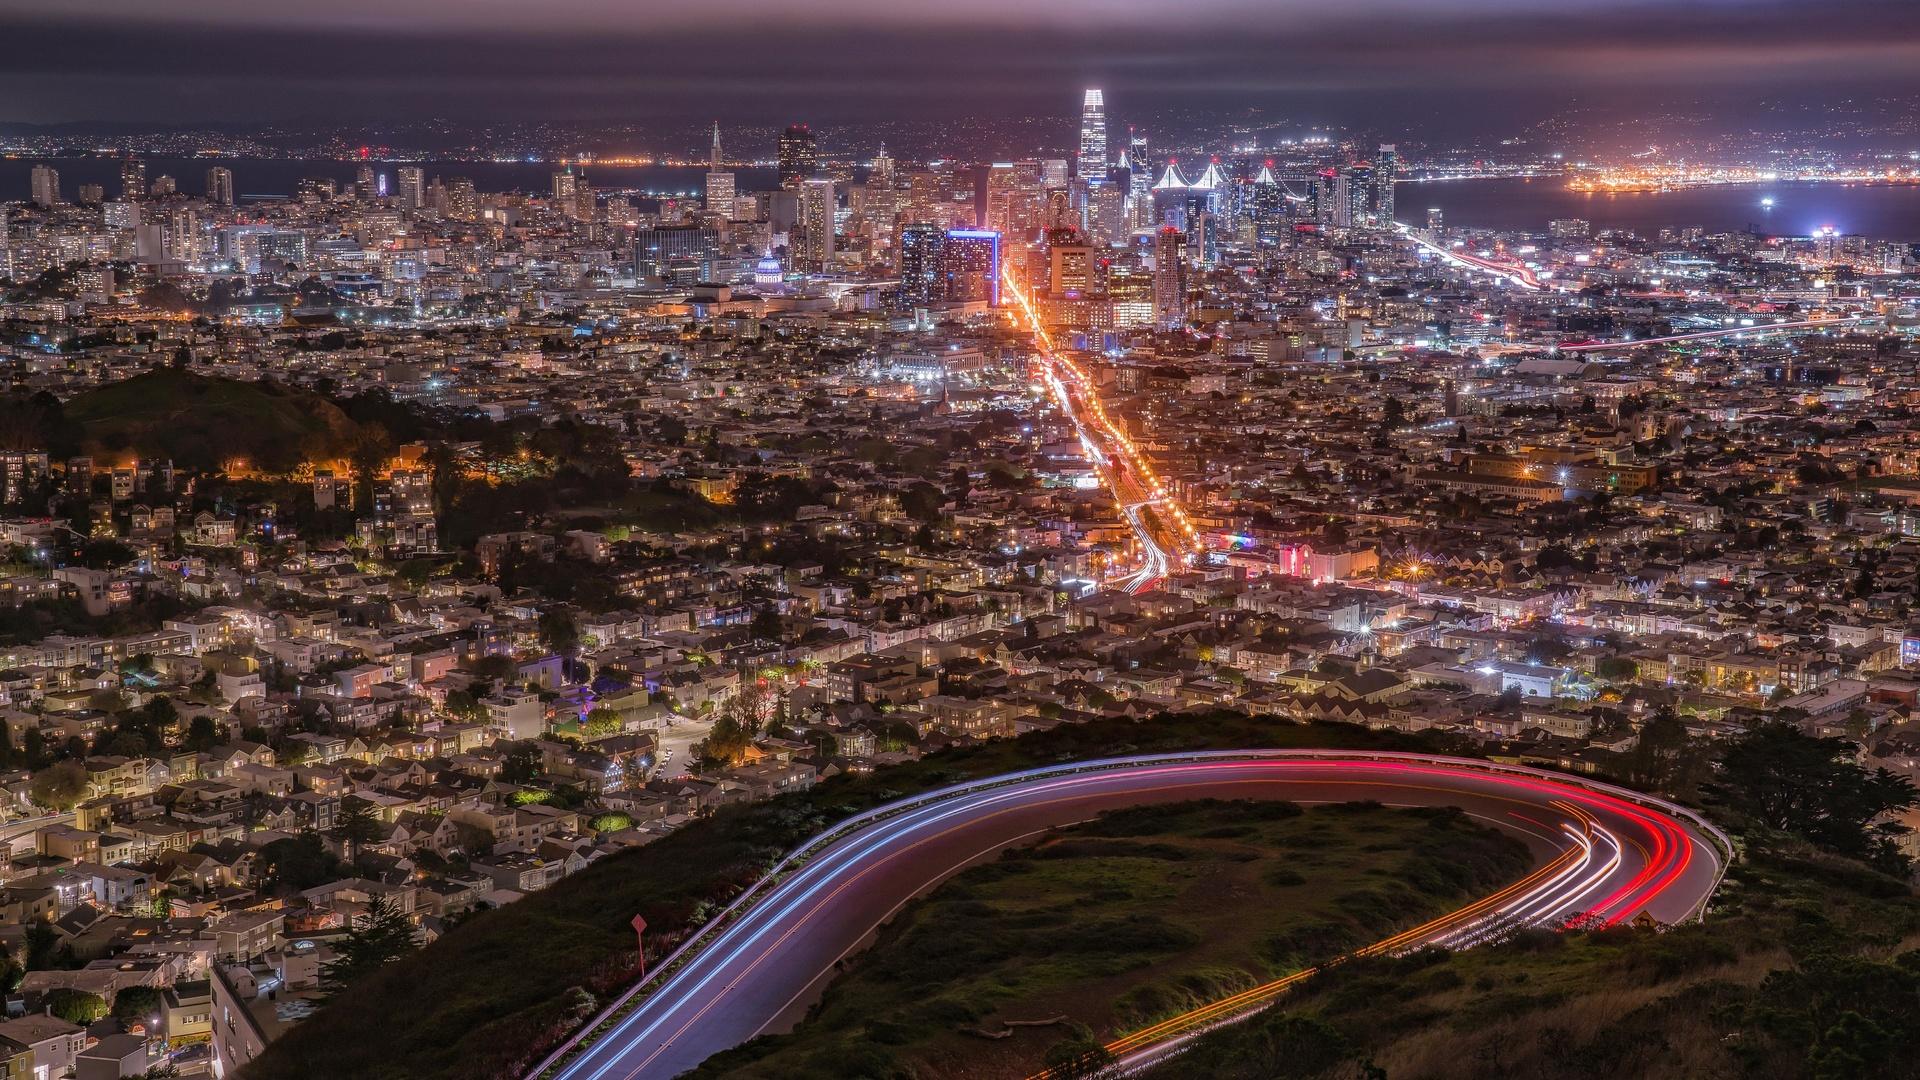 мегаполис, сан-франциско, ночь, сверху, город